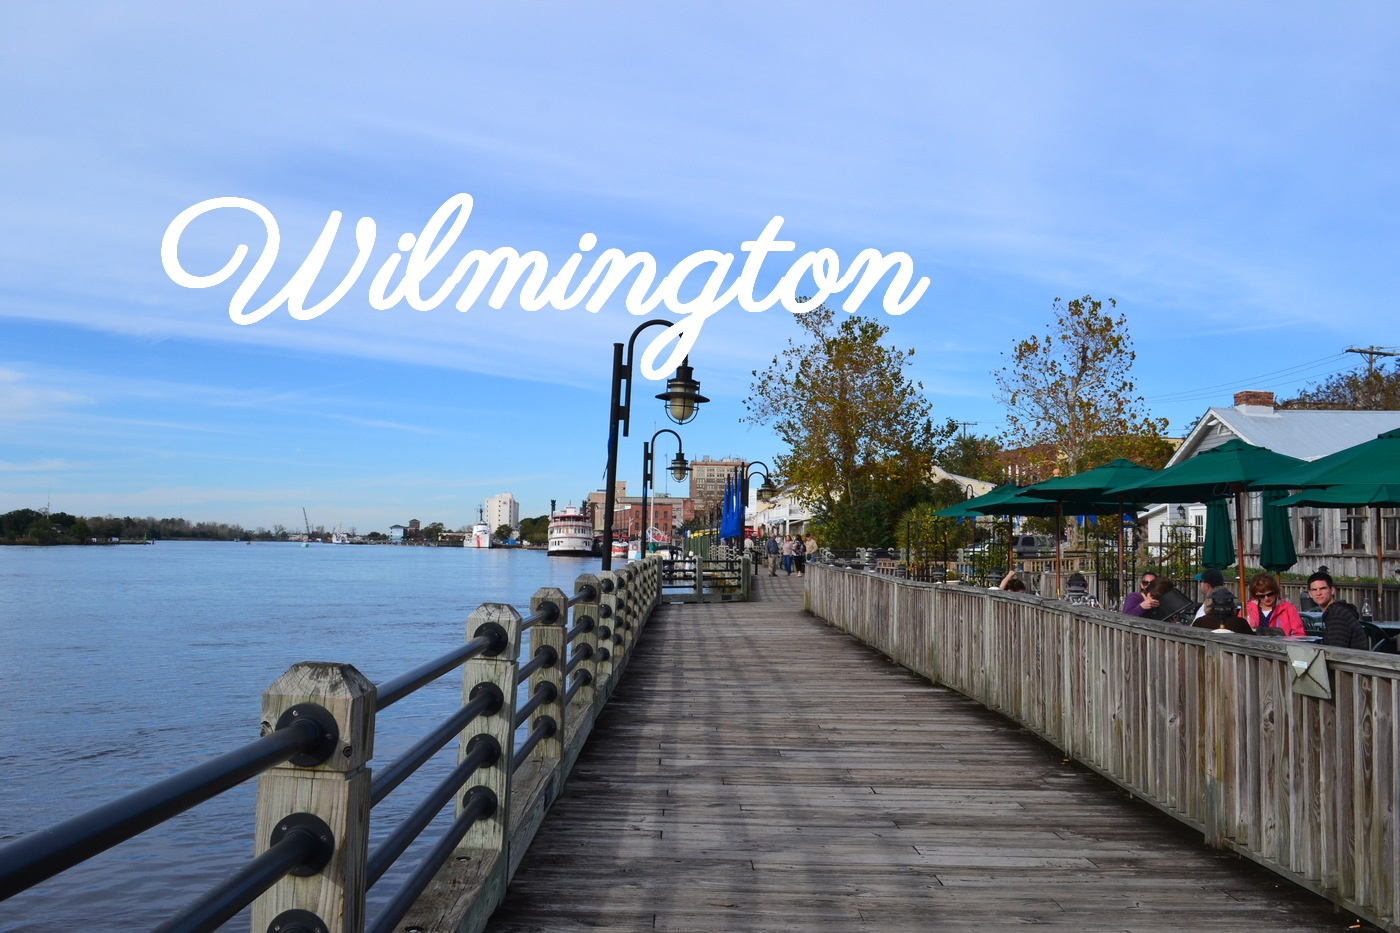 Promenade Wilmington NC